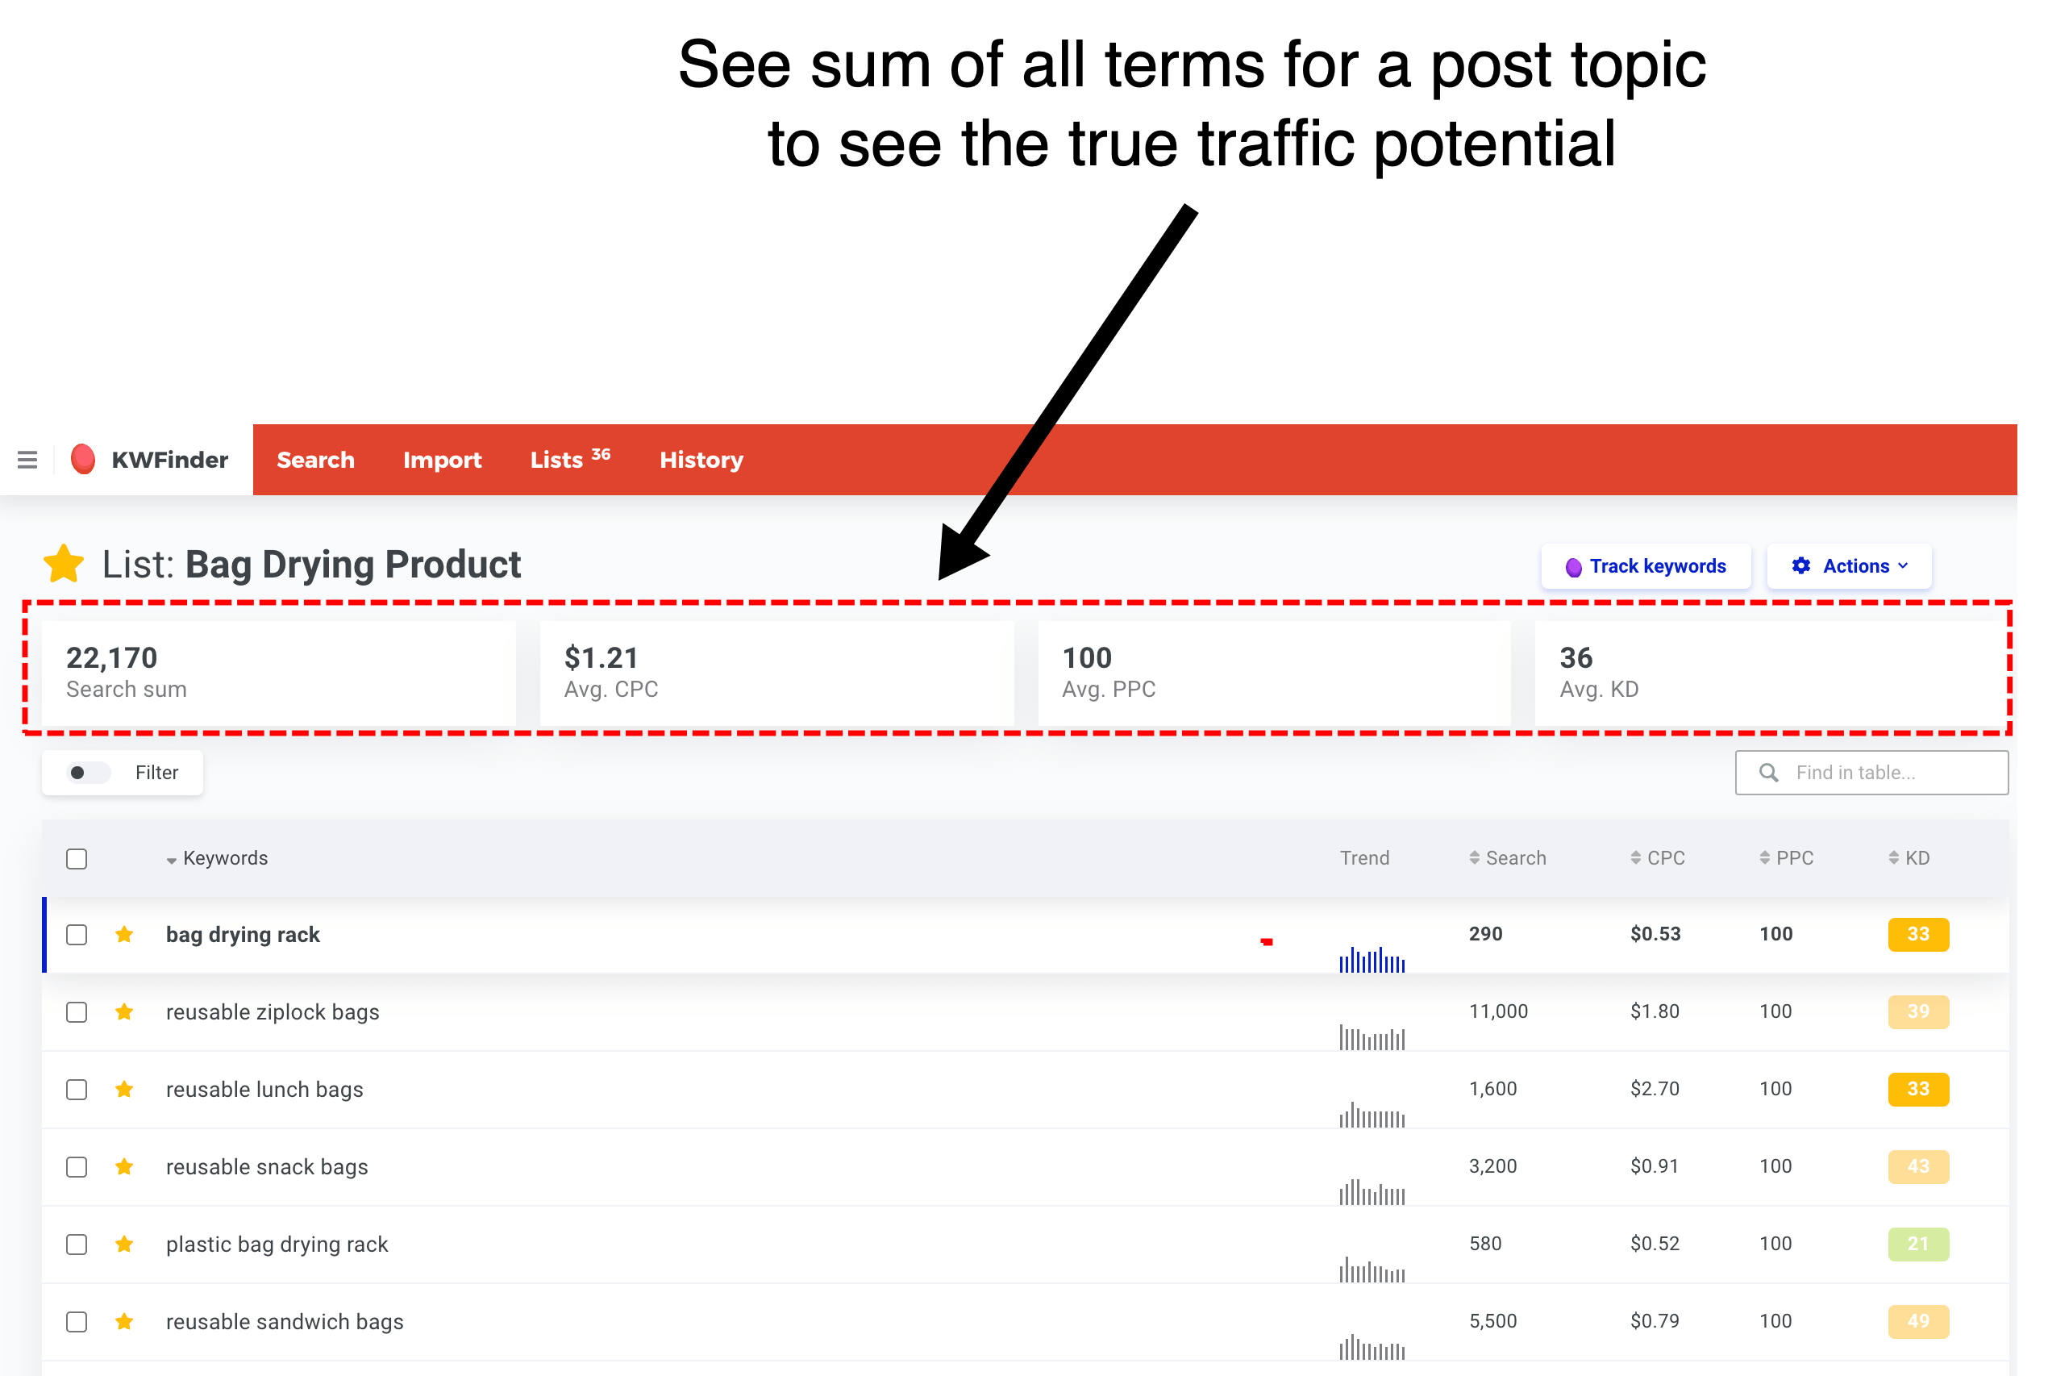 KW Finder features